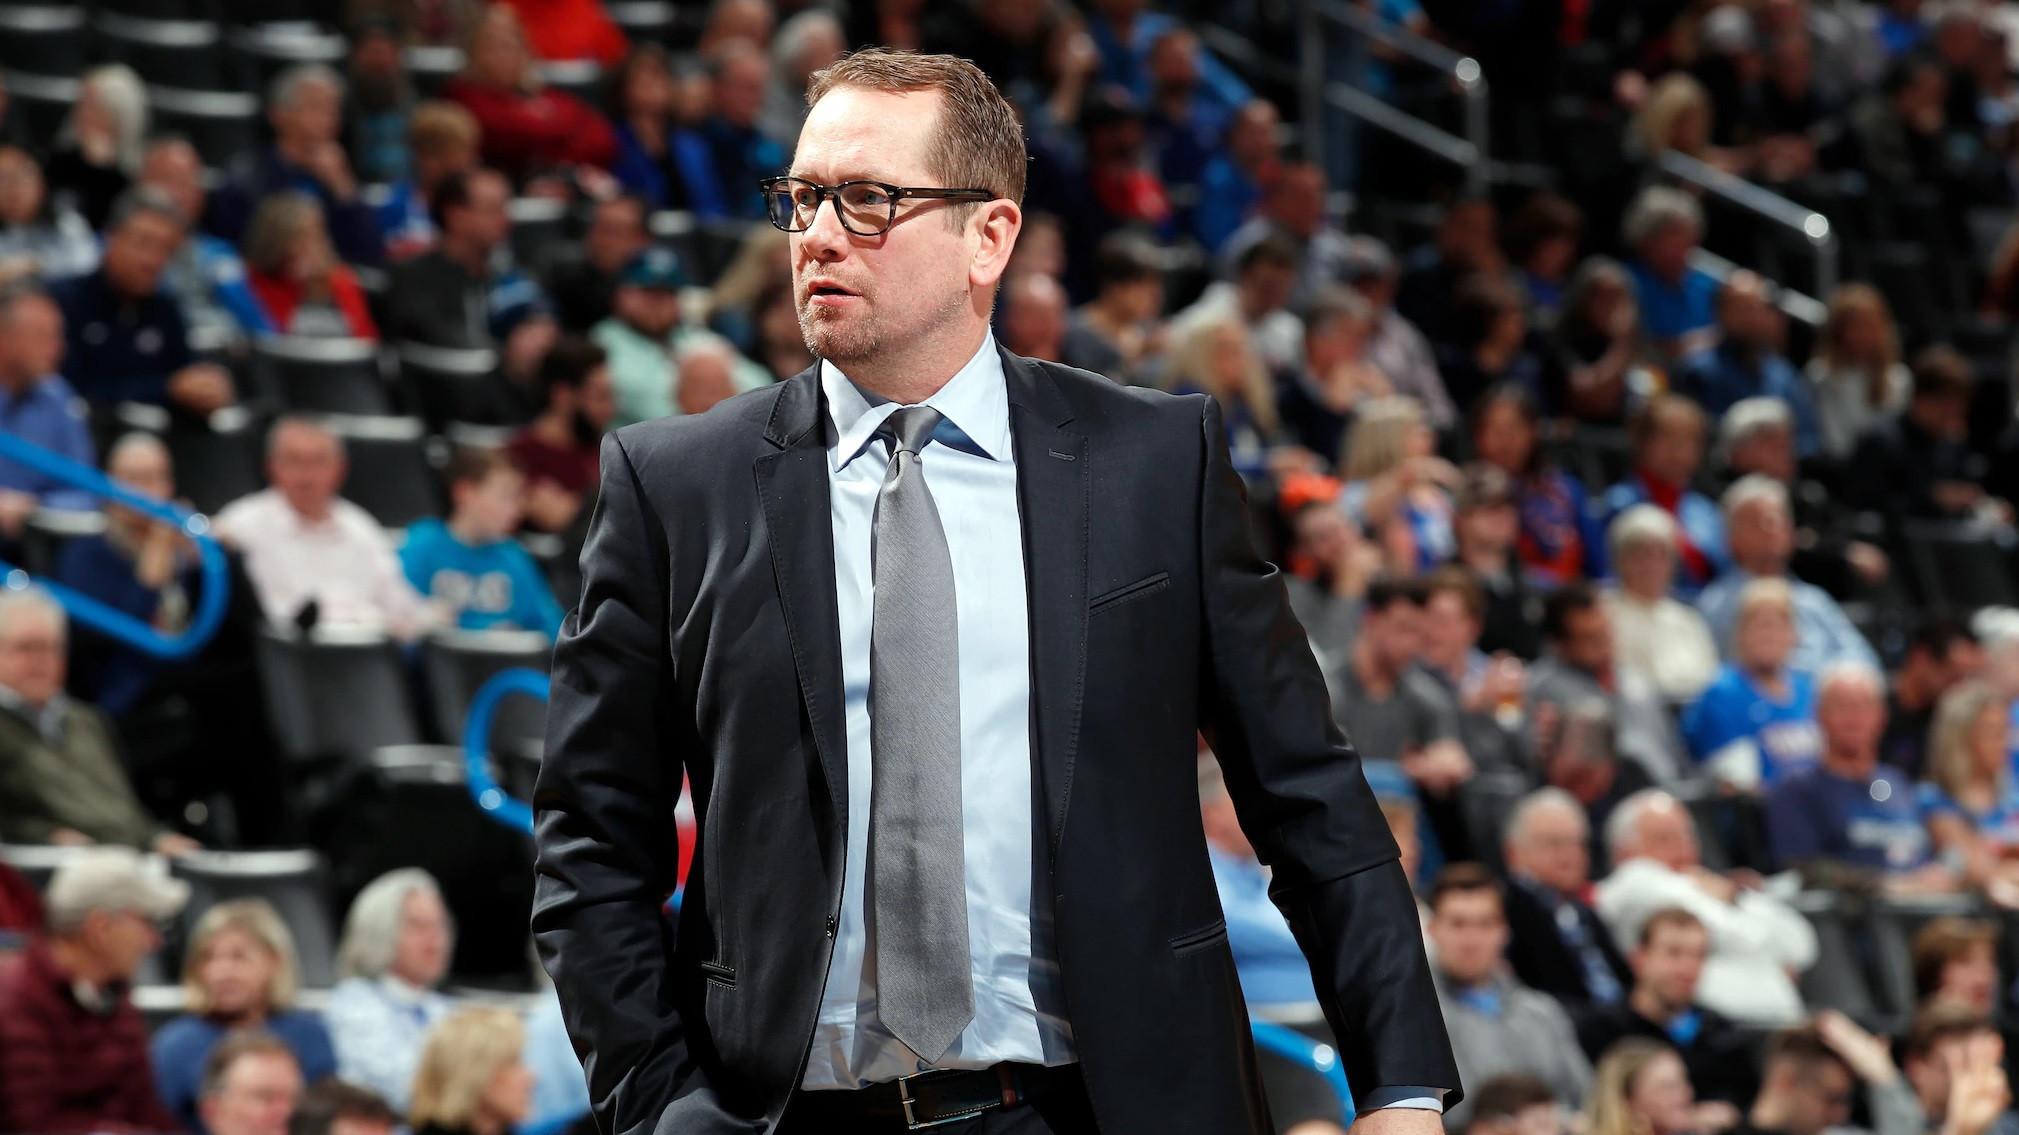 Toronto Raptors Nick Nurse named NBA Coach of the Year